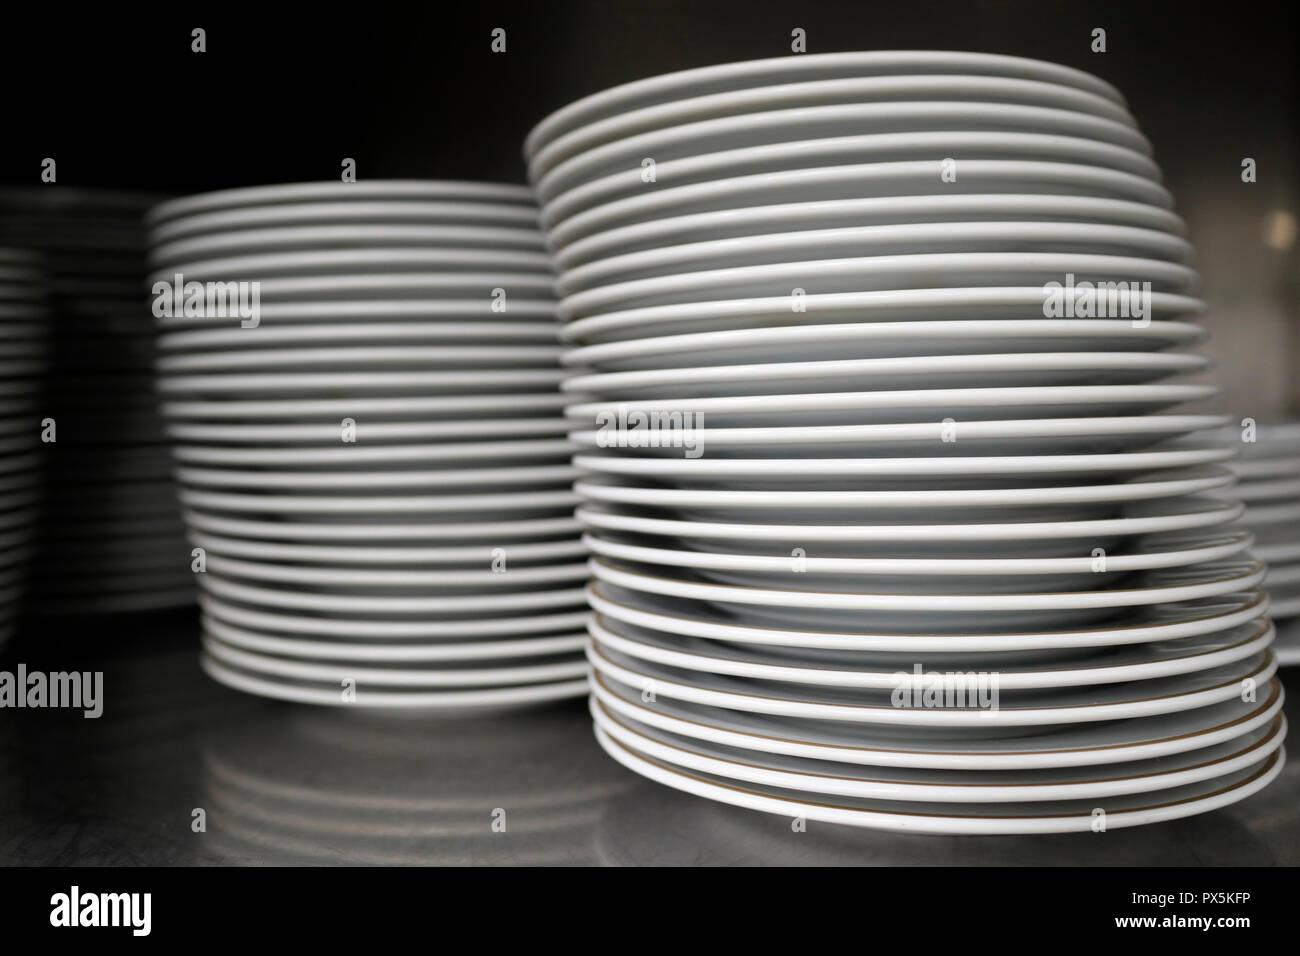 Inauguration du Casino de Saint-Gervais. 19 mai 2018.  Pile of clean ceramic white plates in a restaurant. France. - Stock Image